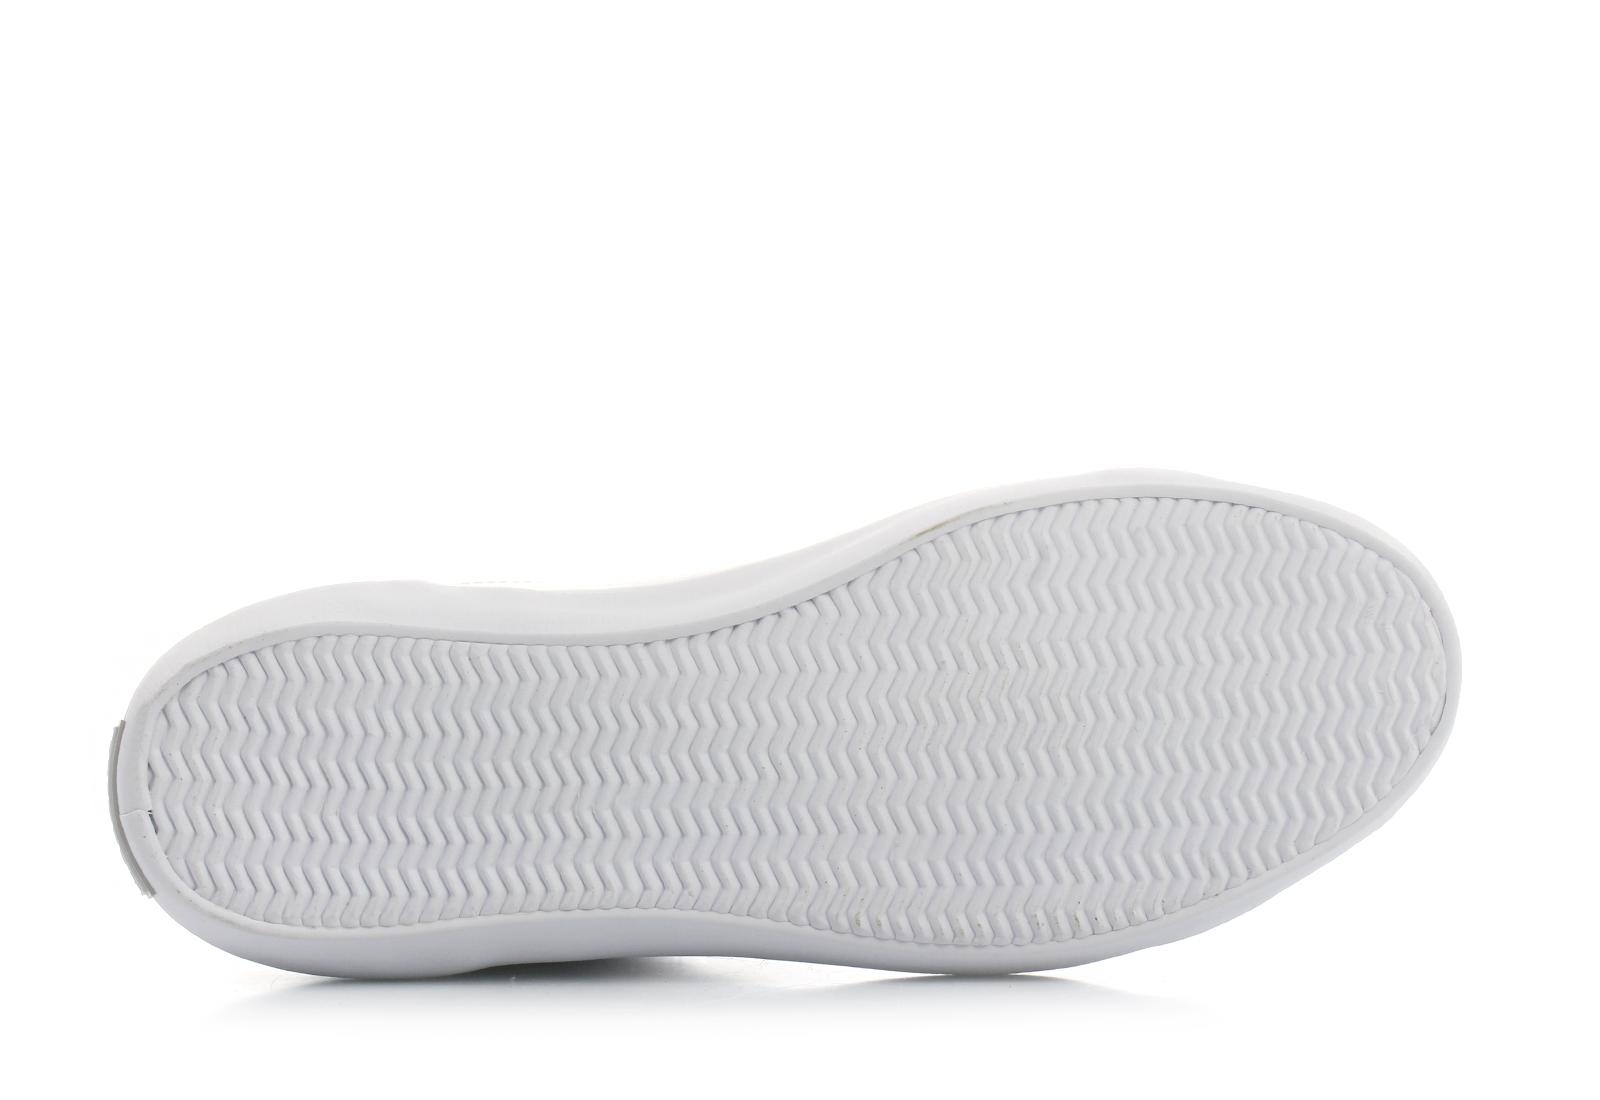 Lacoste Cipő - Lerond - 182caw0093-001 - Office Shoes Magyarország 648a2a264c